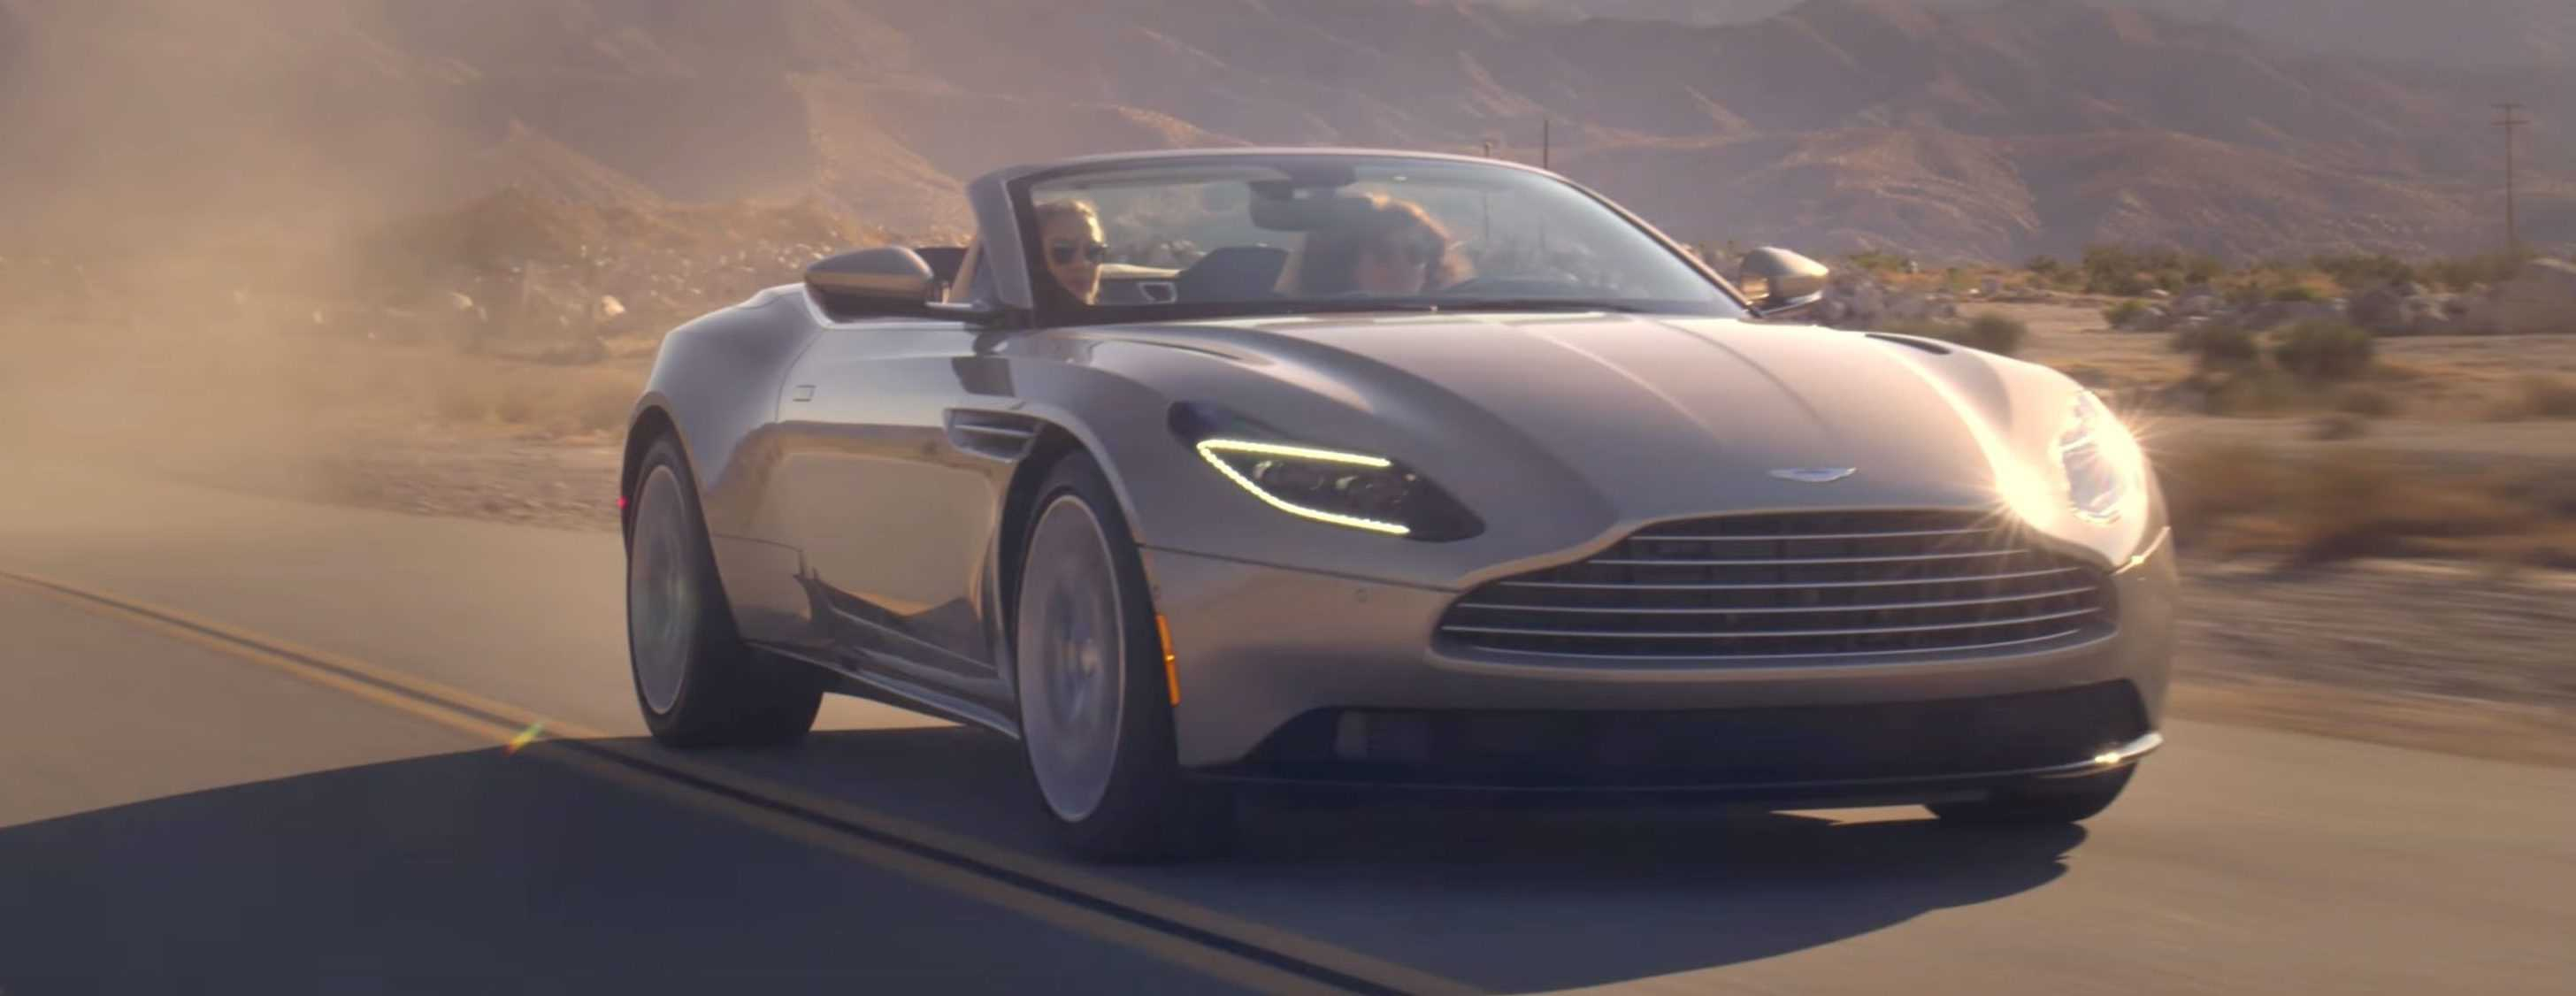 Aston Martin DB11 Volante 2017